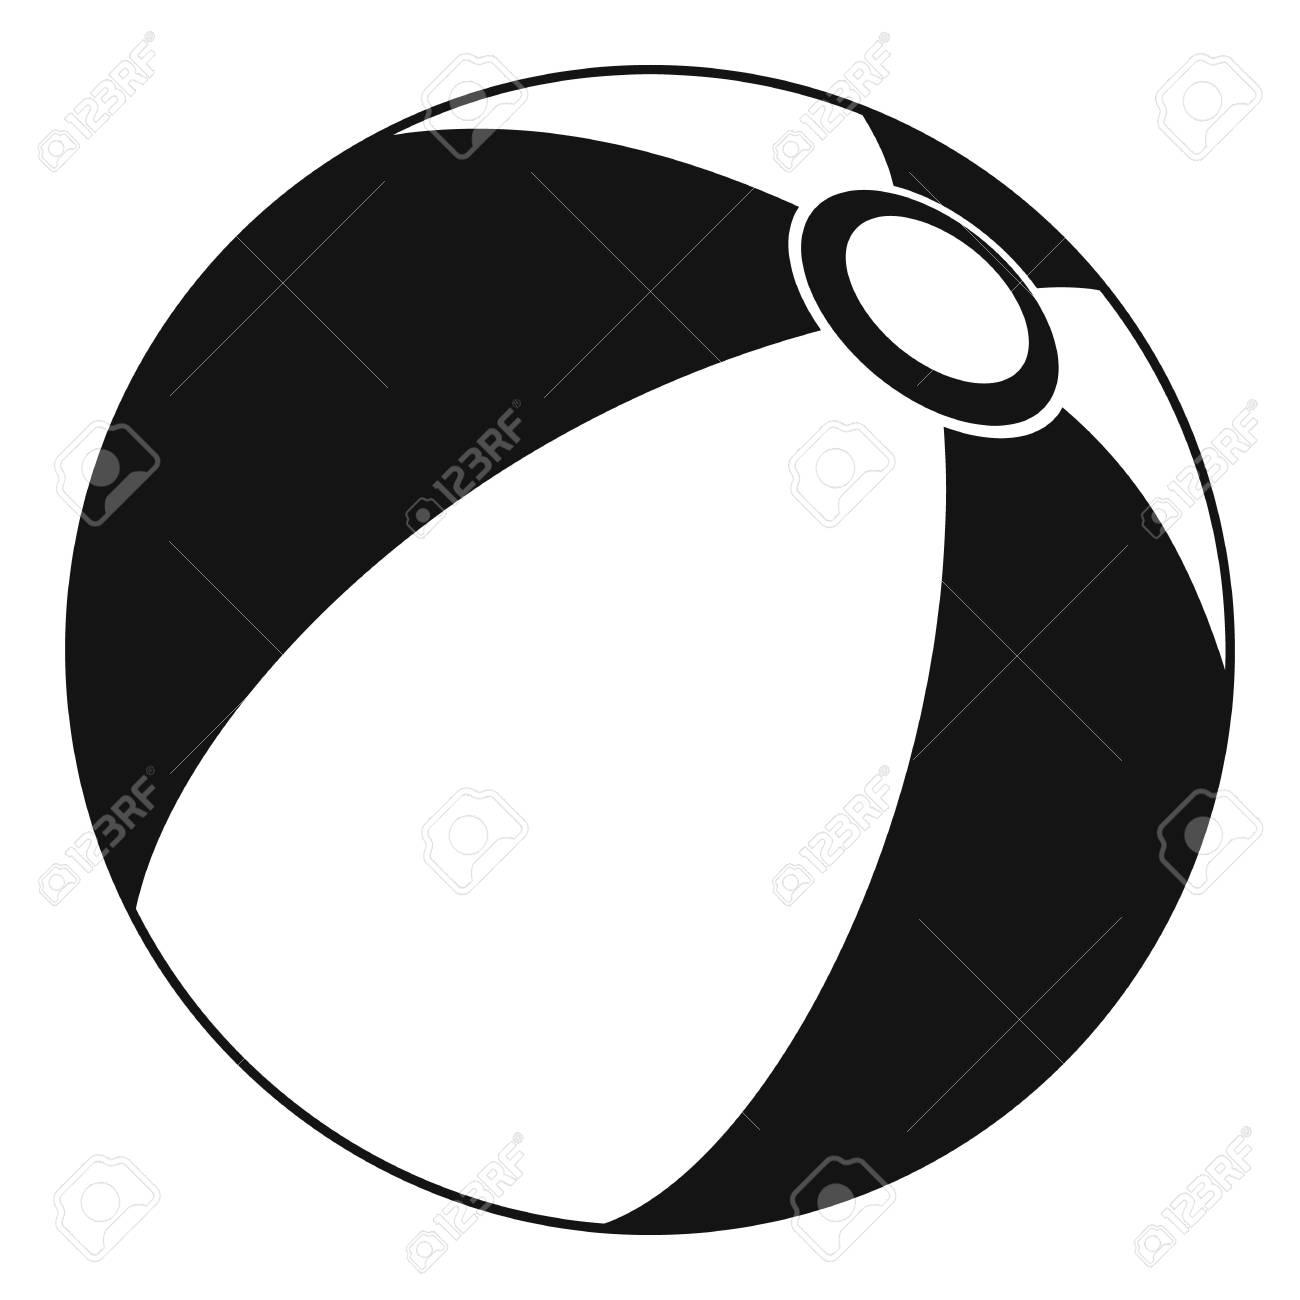 beach ball icon simple illustration of beach ball vector icon rh 123rf com